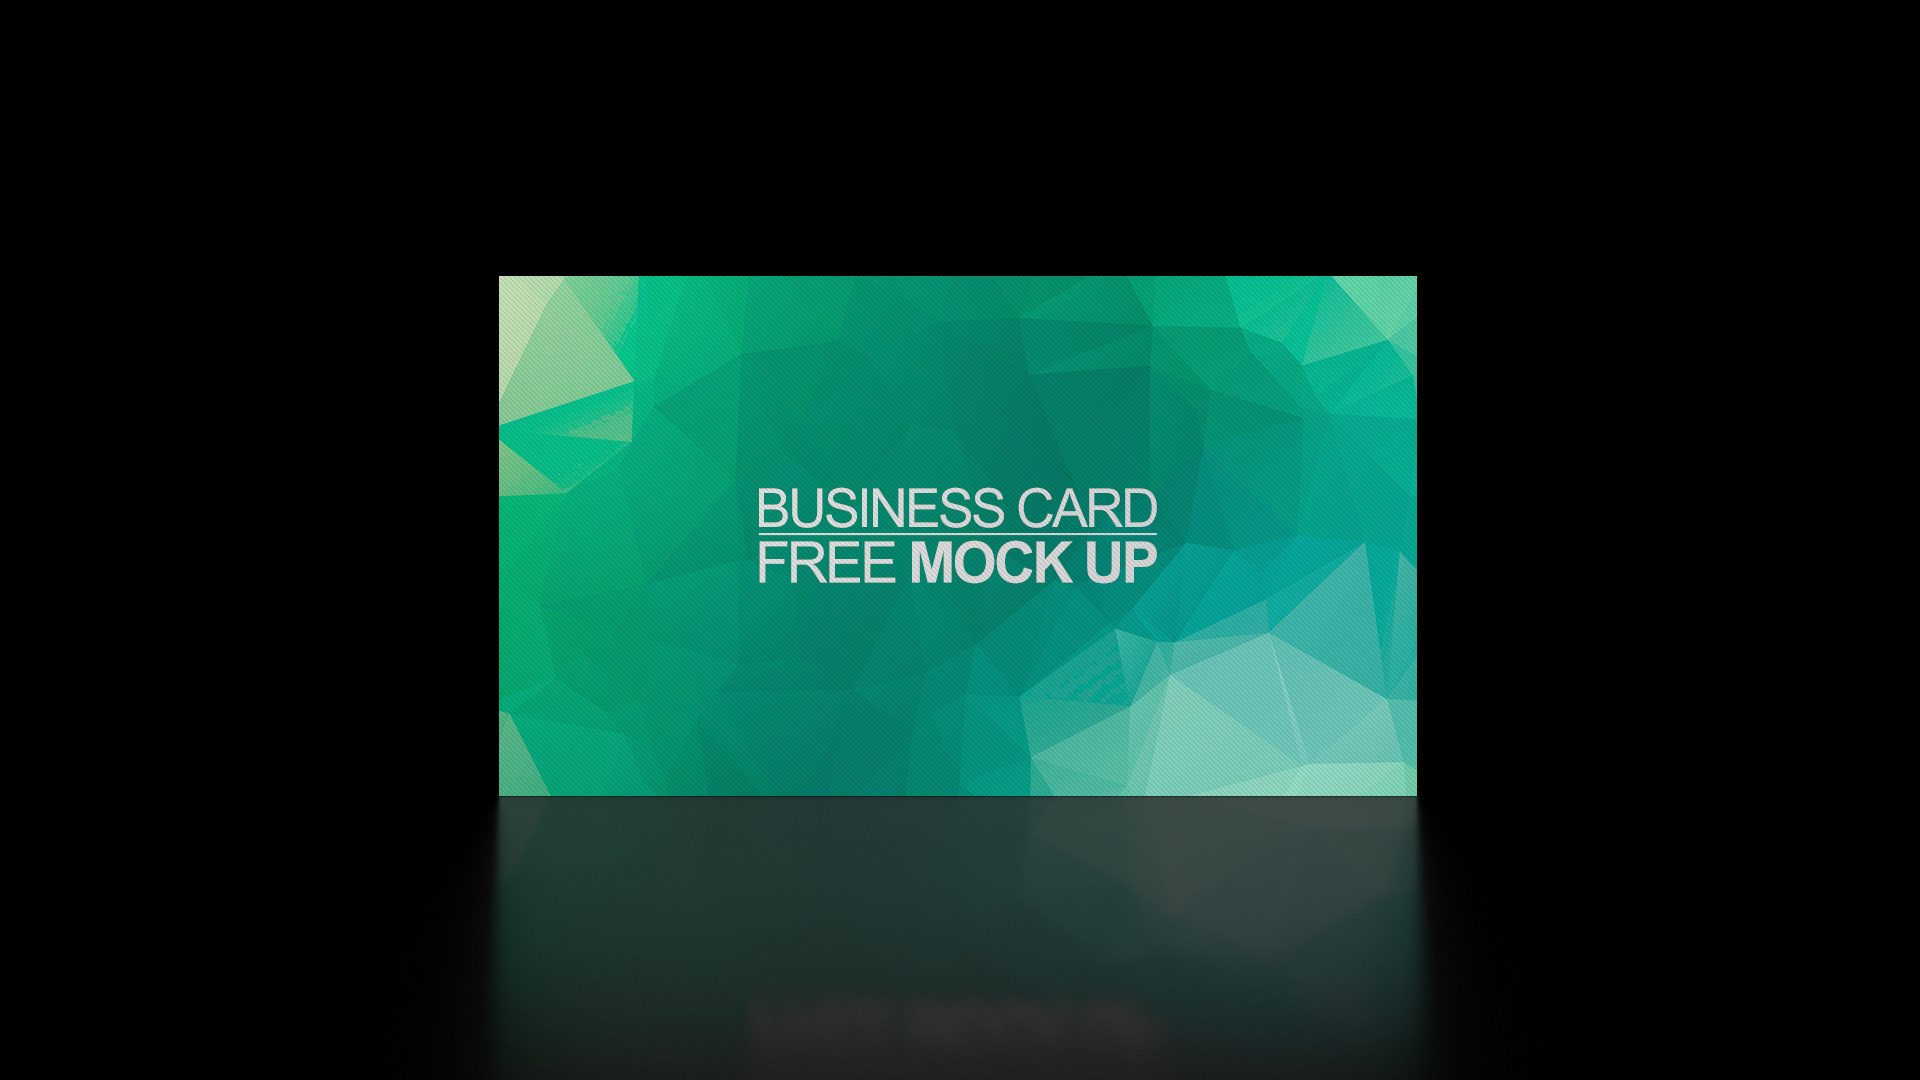 Business card free mock up PSD Black